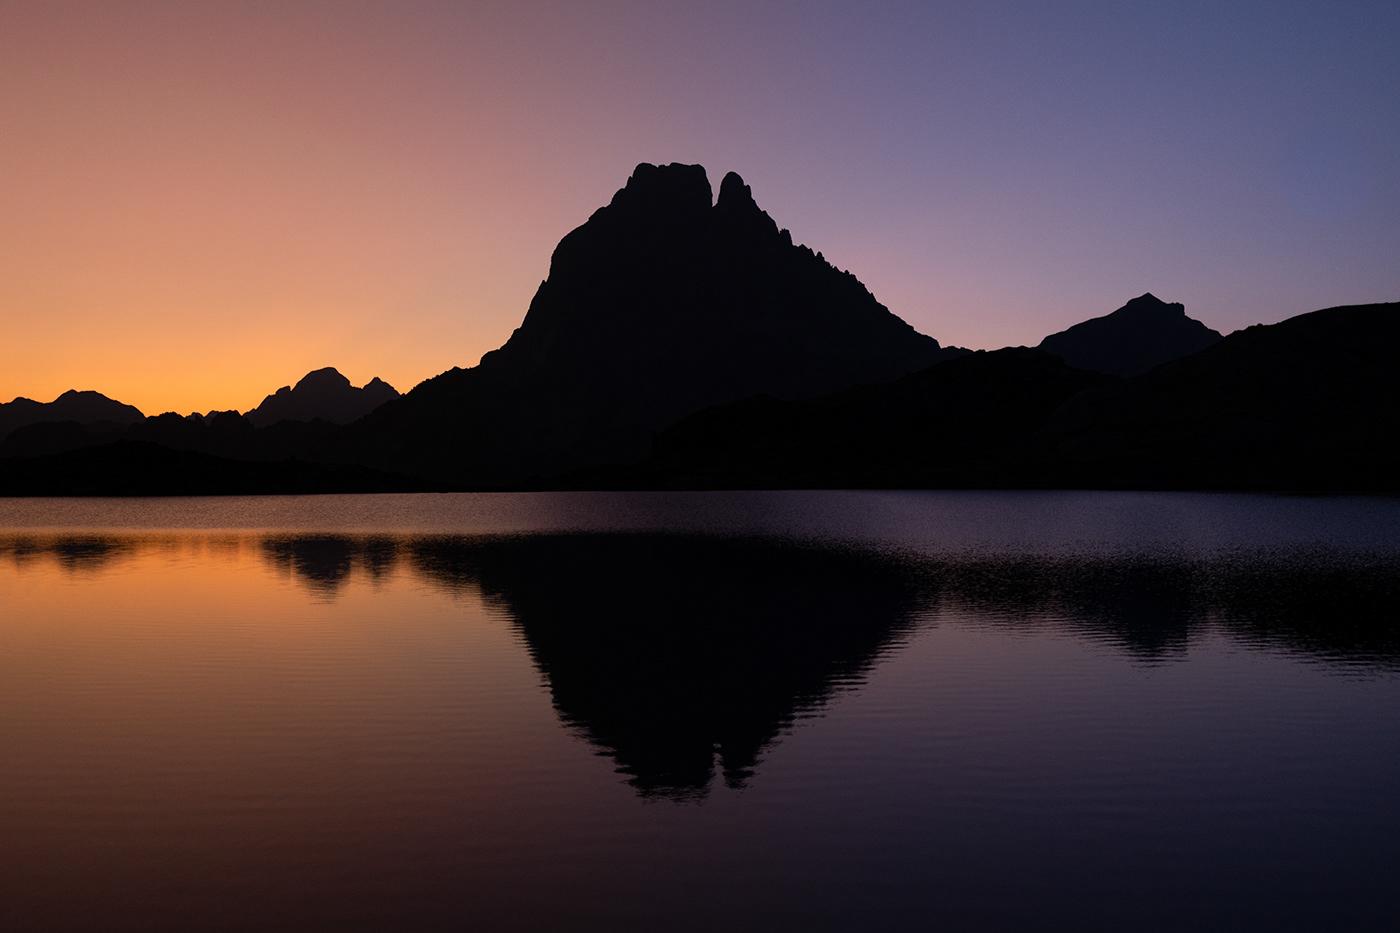 mountains peaks Minimalism pyrenees france Landscape Outdoor pic midi hiking art